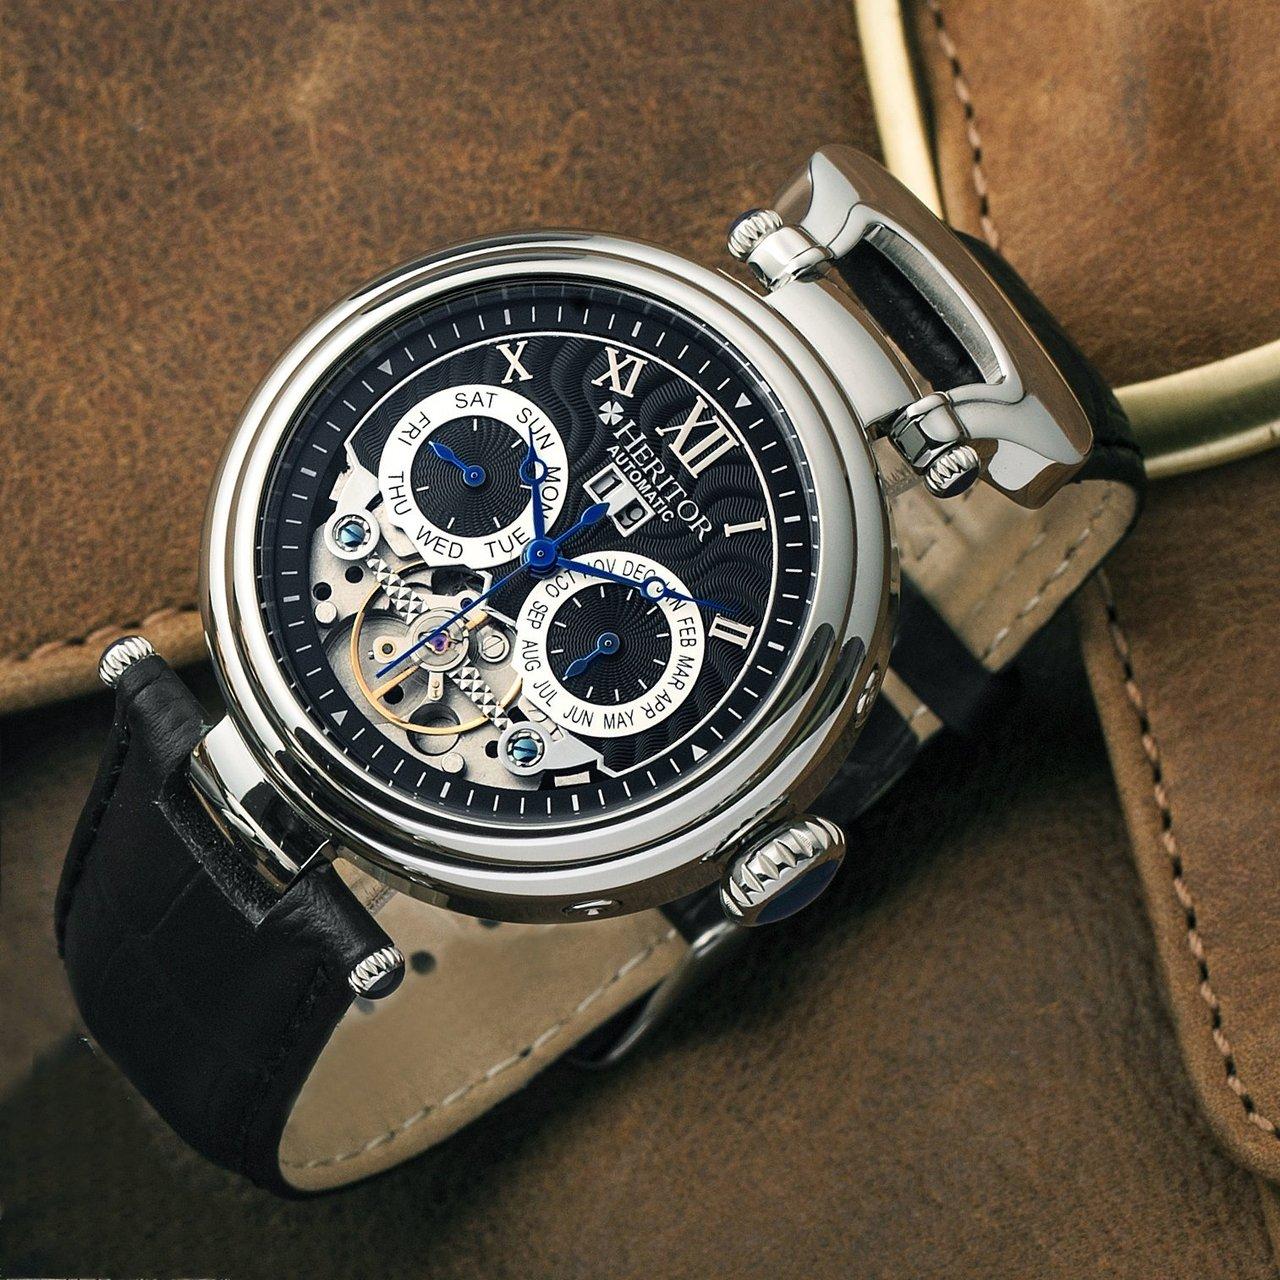 Heritor Automatic Ganzi Semi-Skeleton Leather-Band Day Date Watch